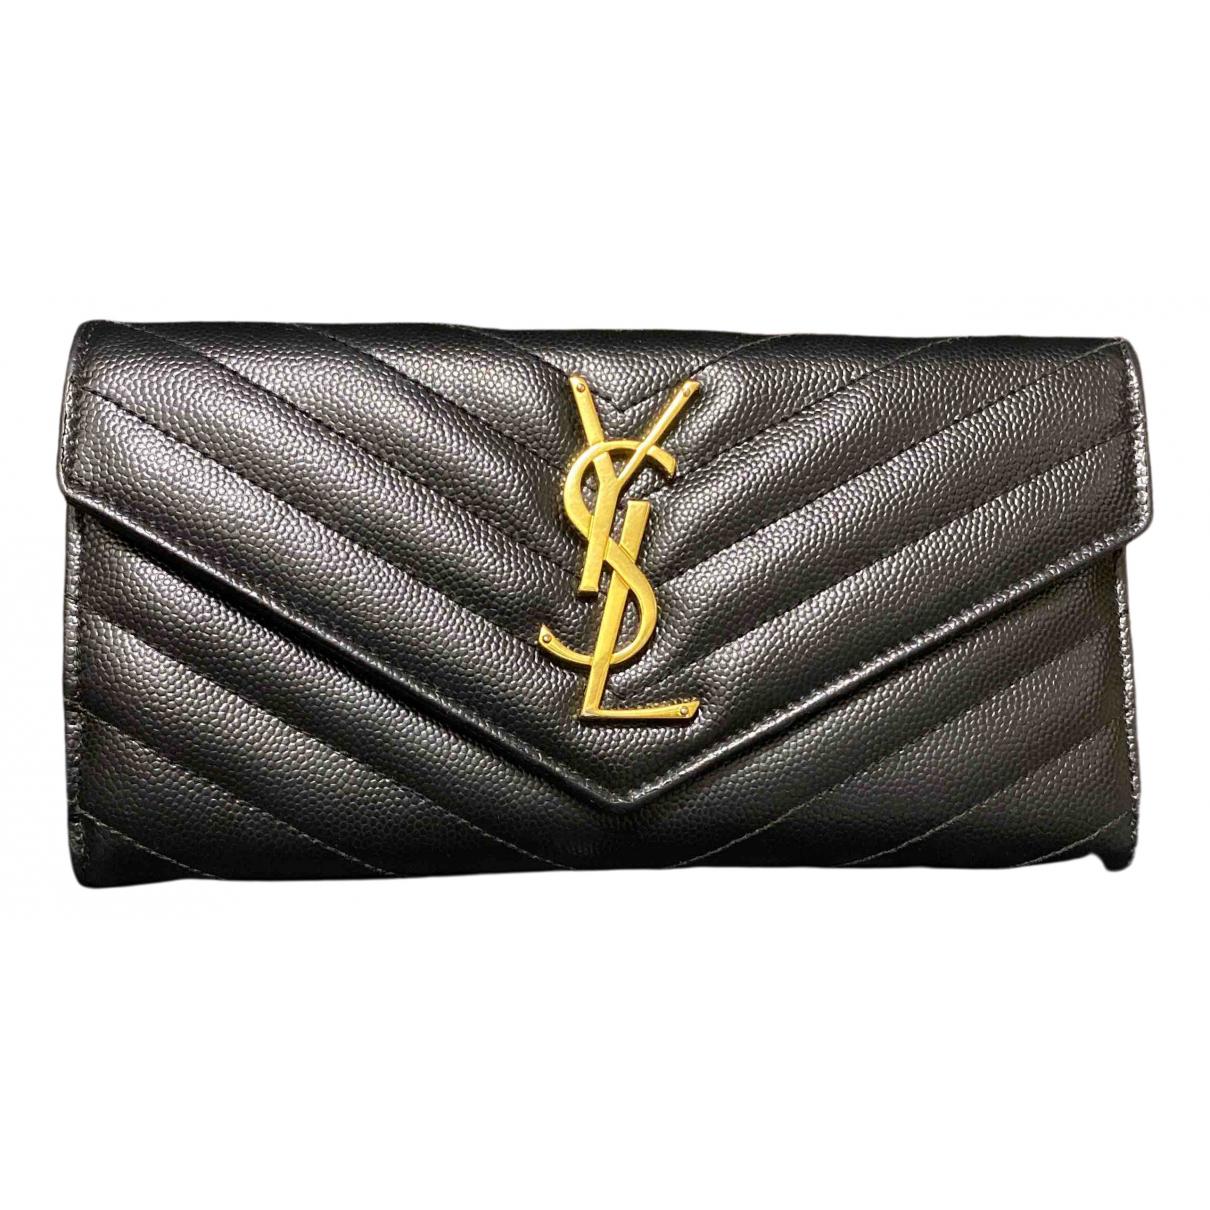 Yves Saint Laurent Belle de Jour Black Leather wallet for Women N